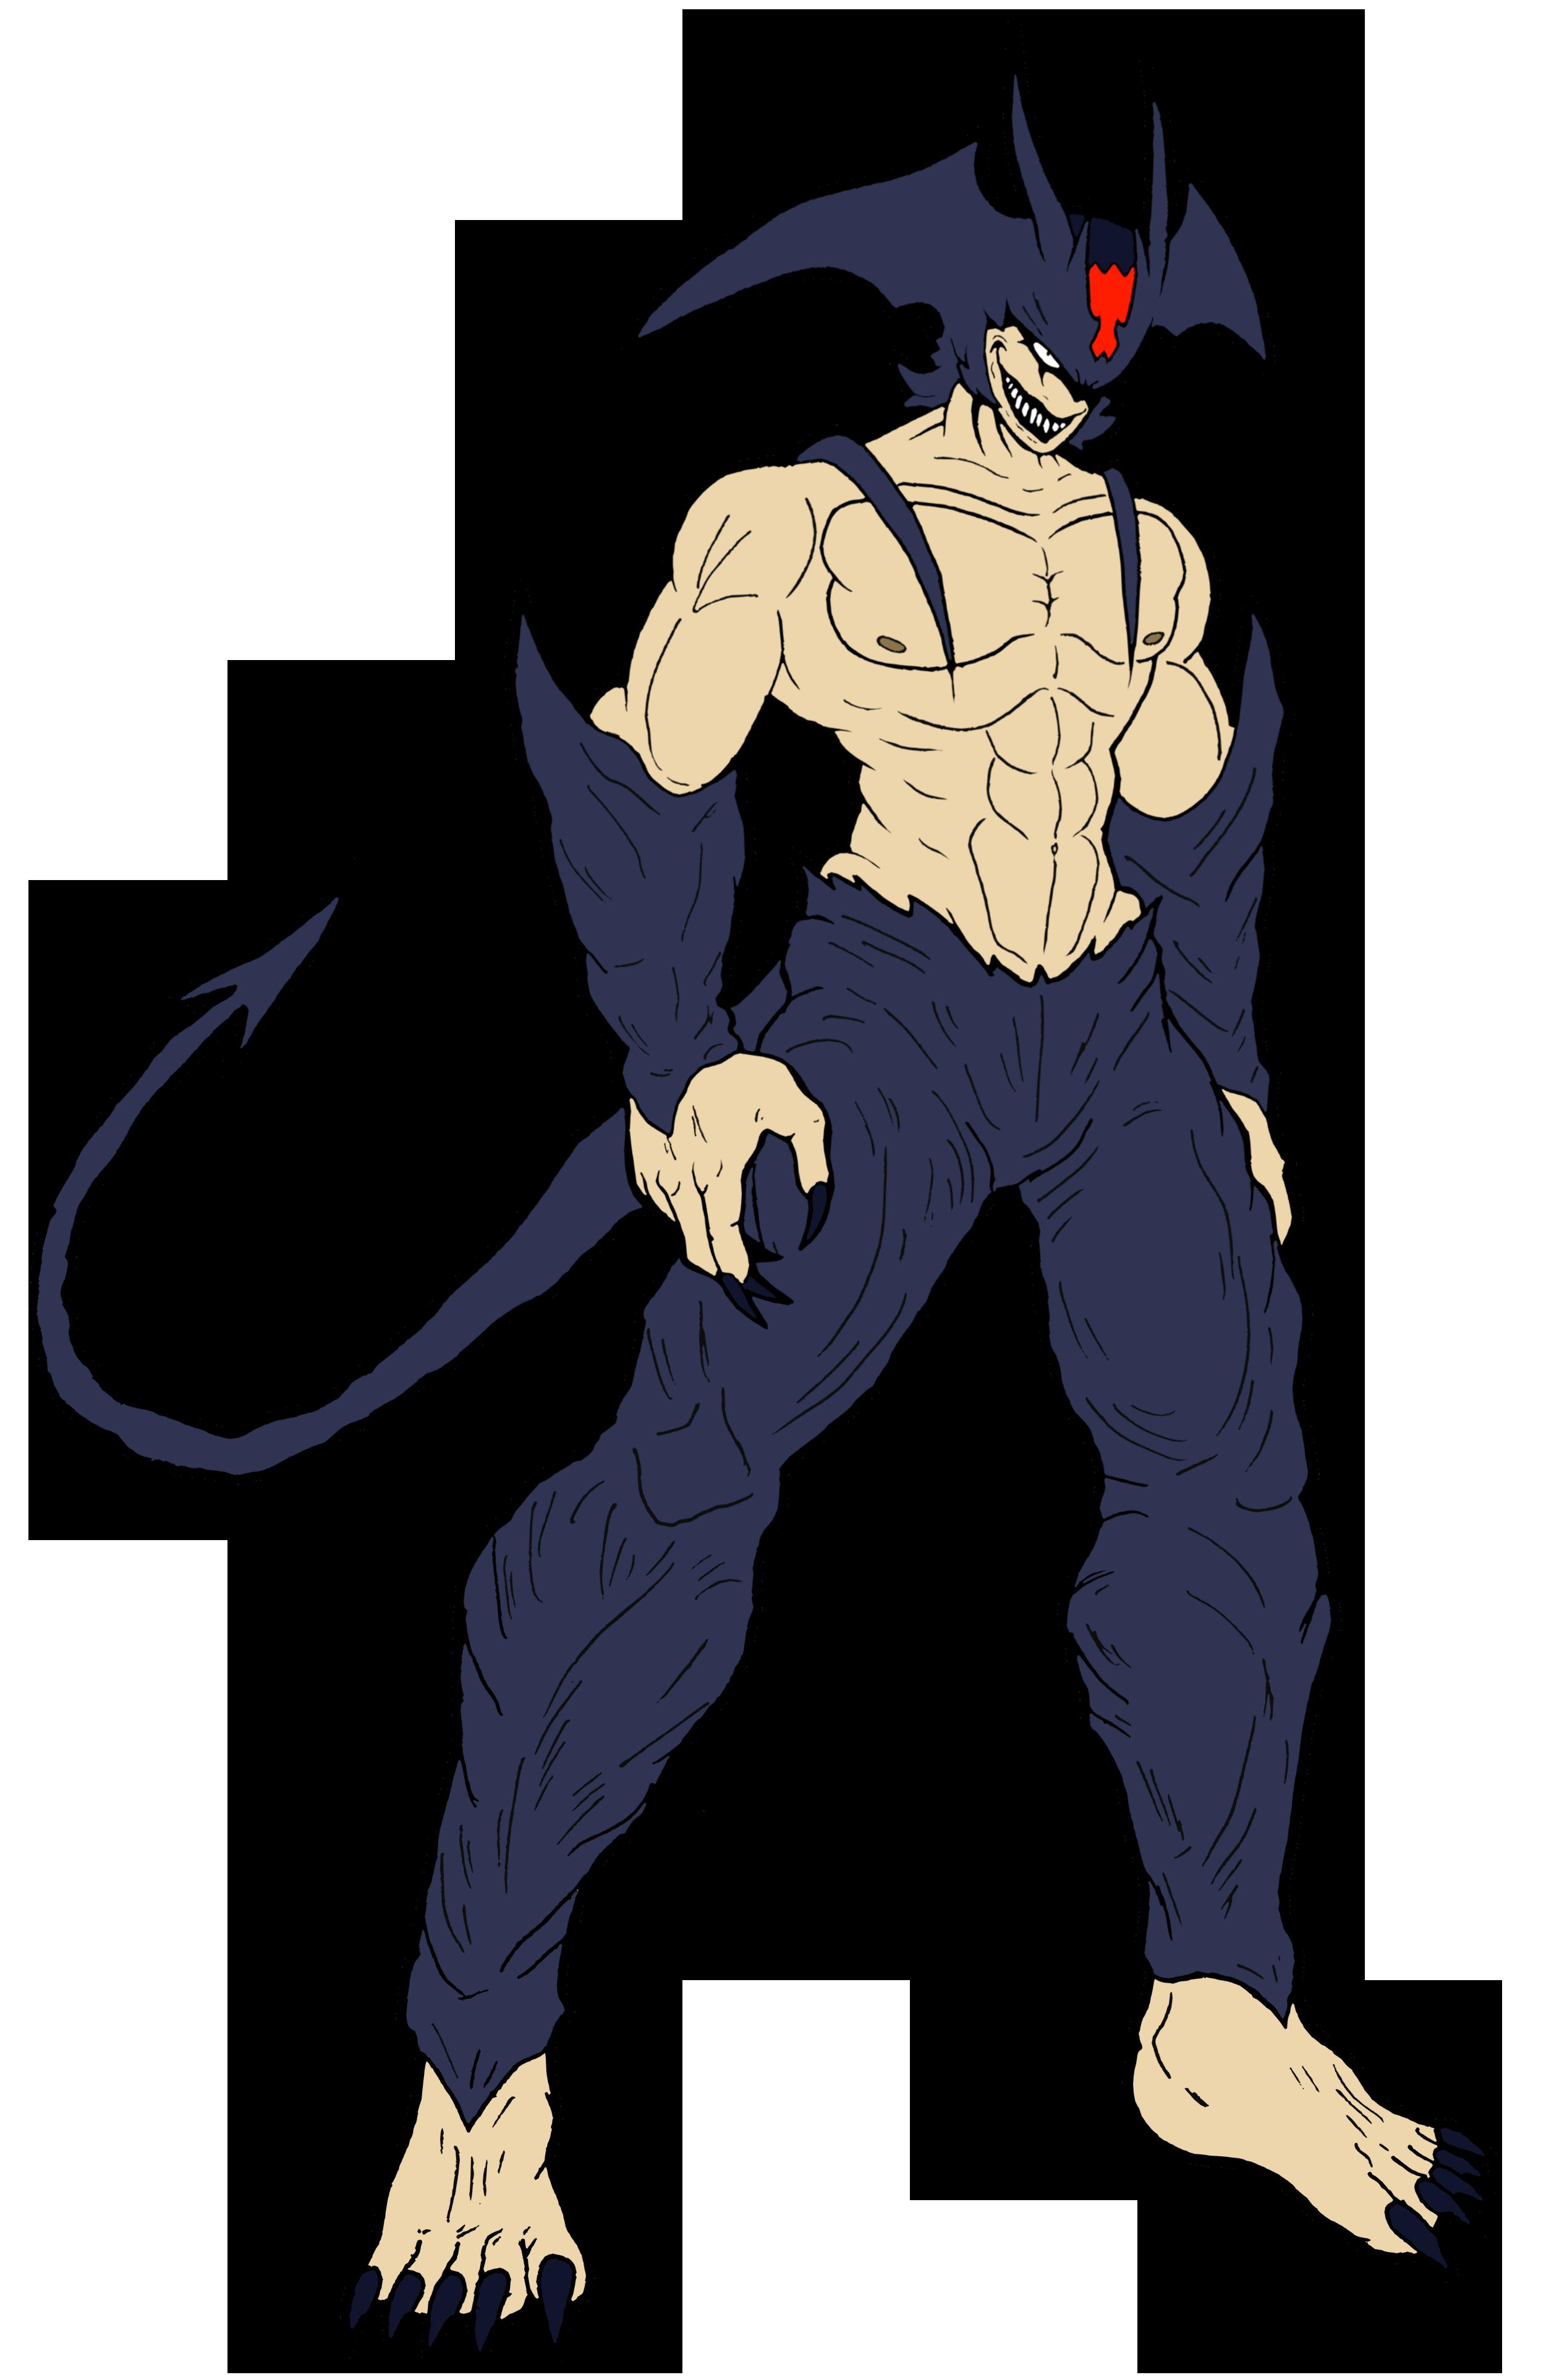 Devil devil man